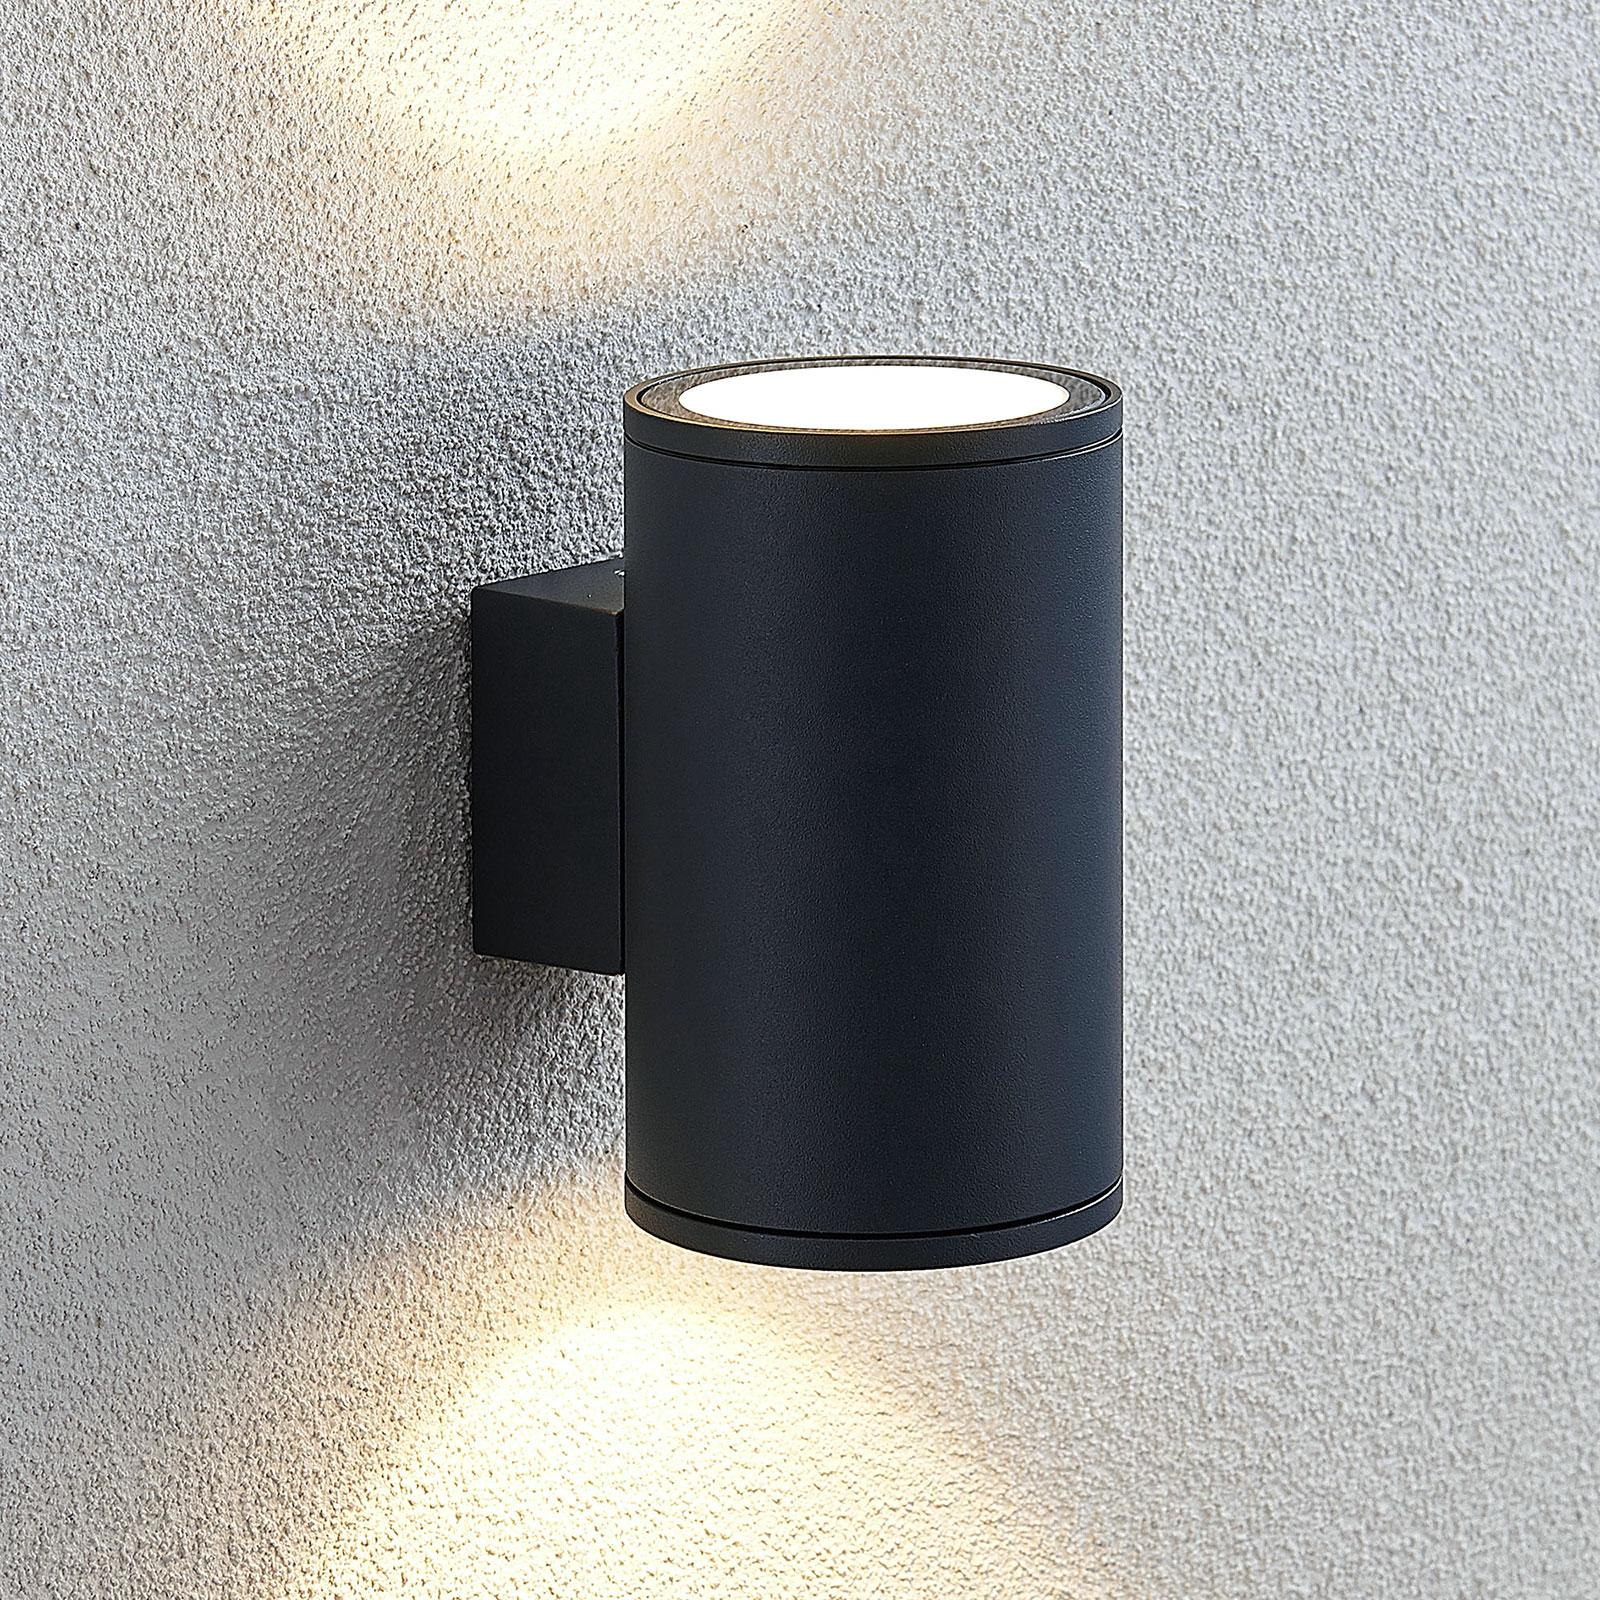 Applique LED da esterni Visavia, 2 punti luce